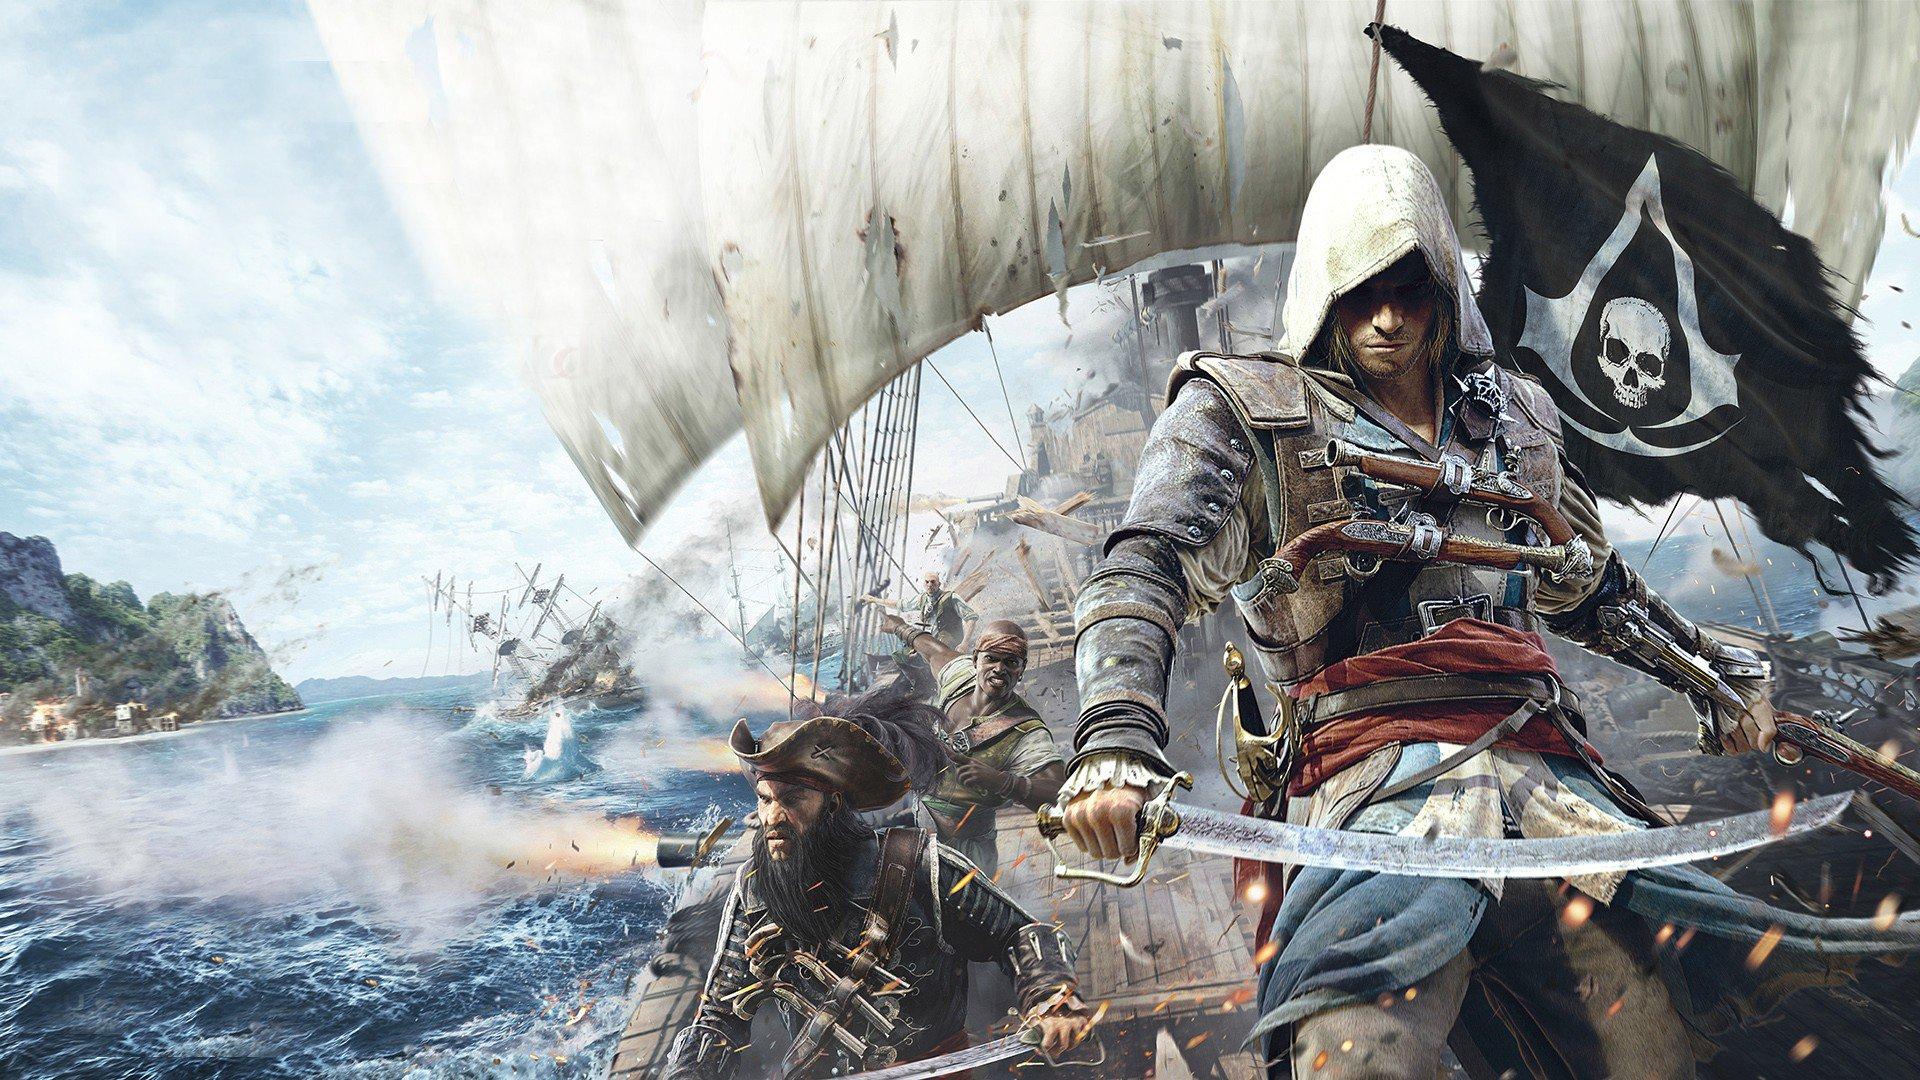 Assassins Creed 4 Black Flag Assasins Creed Wallpaper Hd